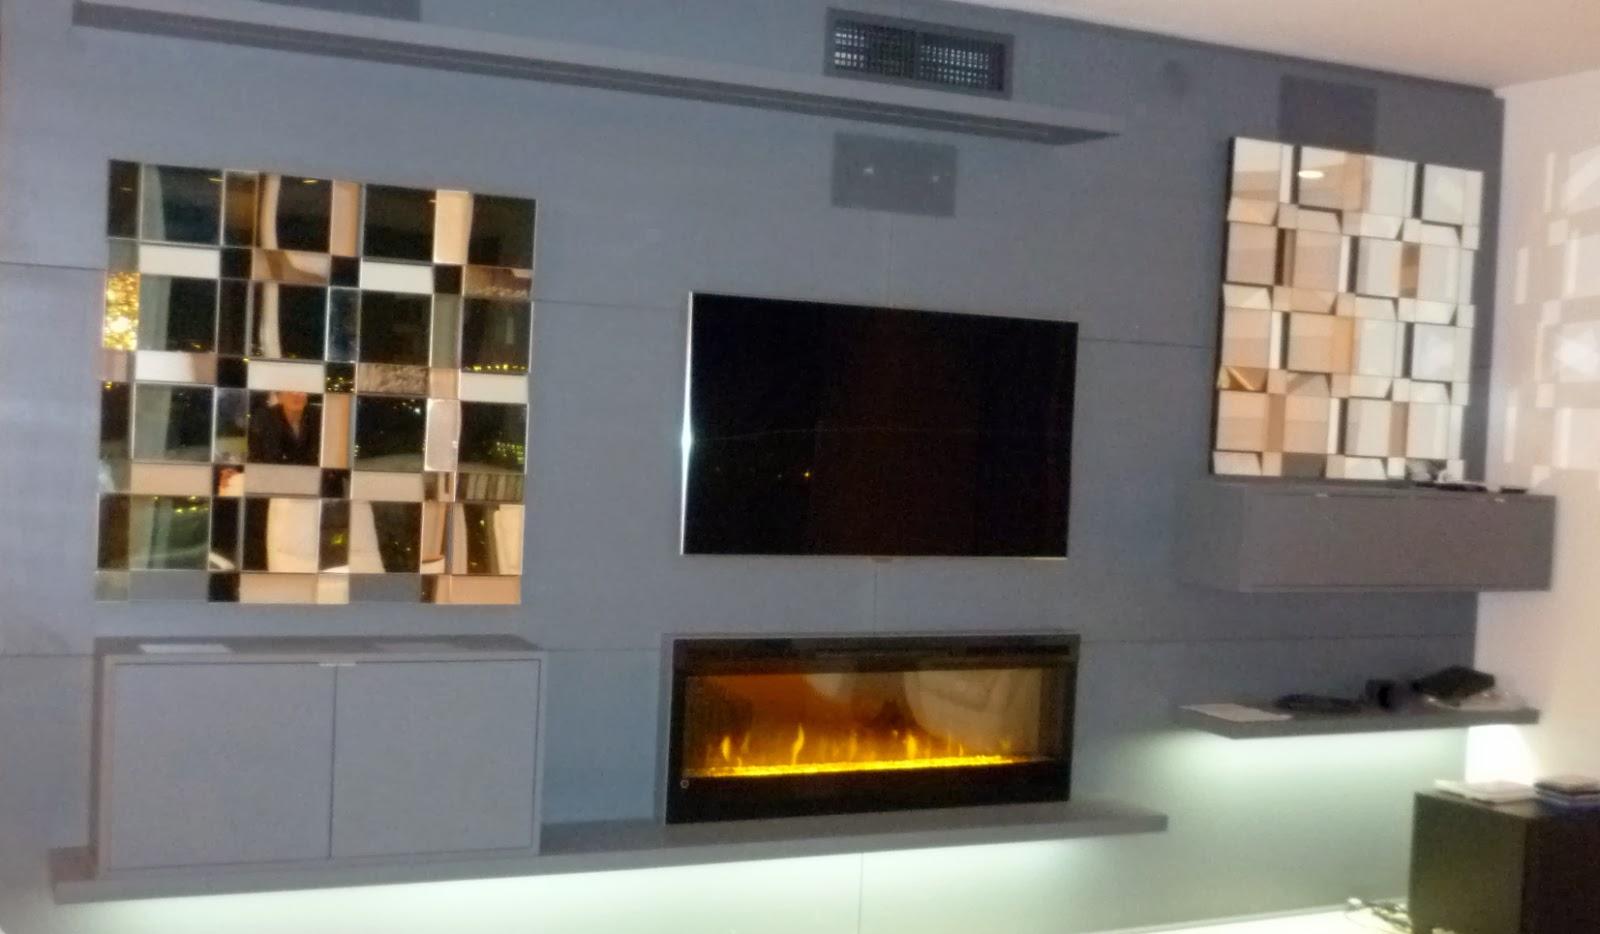 Wallunit Fireplacelights Image Robin Lechner